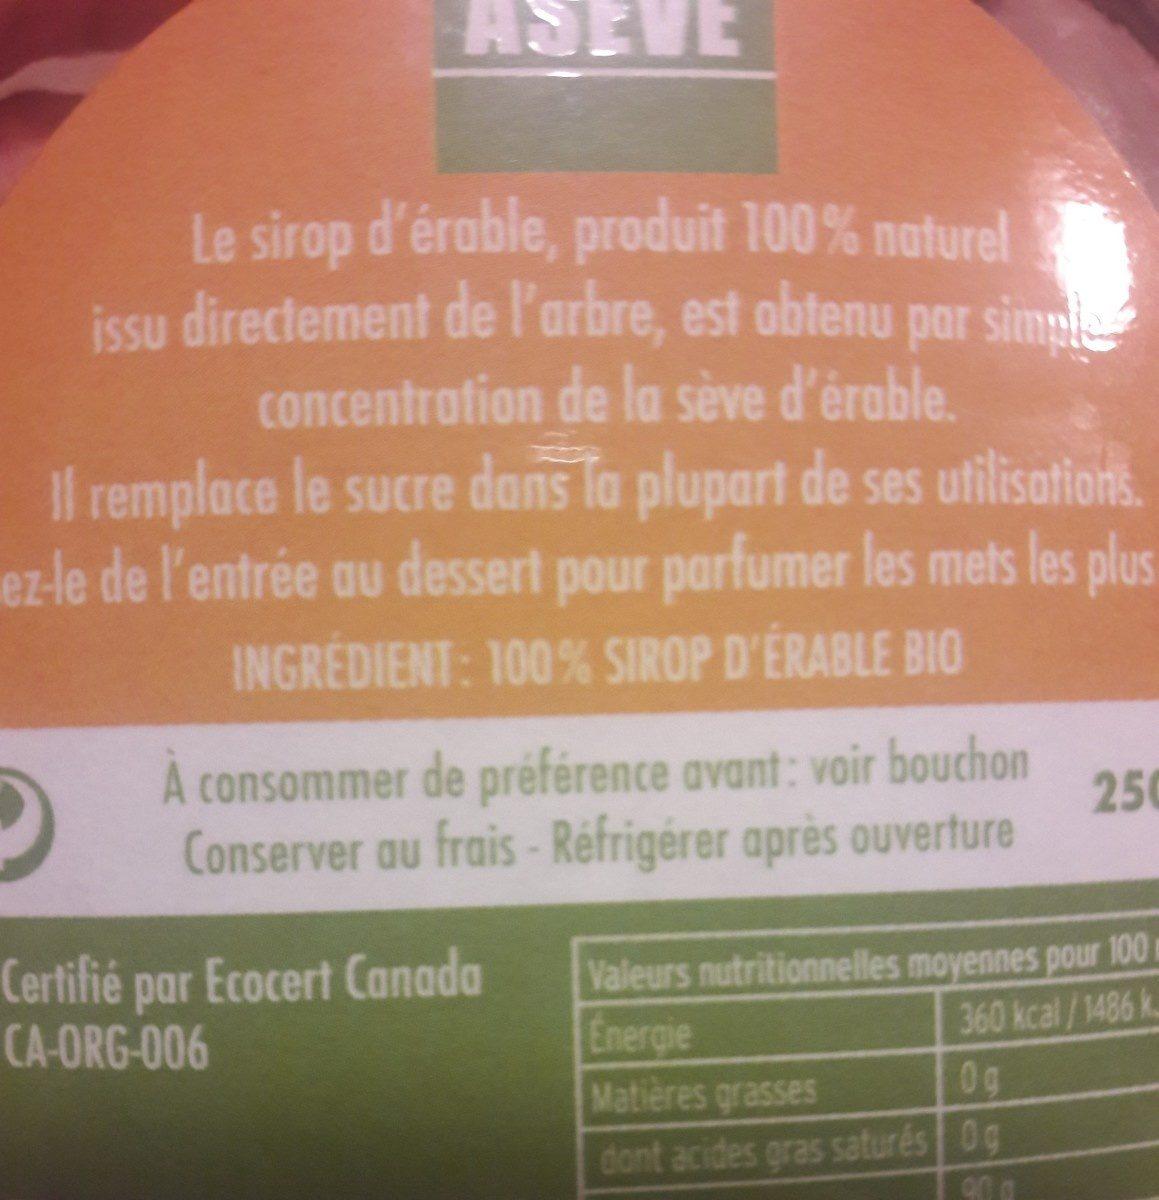 Sirop d'érable bio - Ingredients